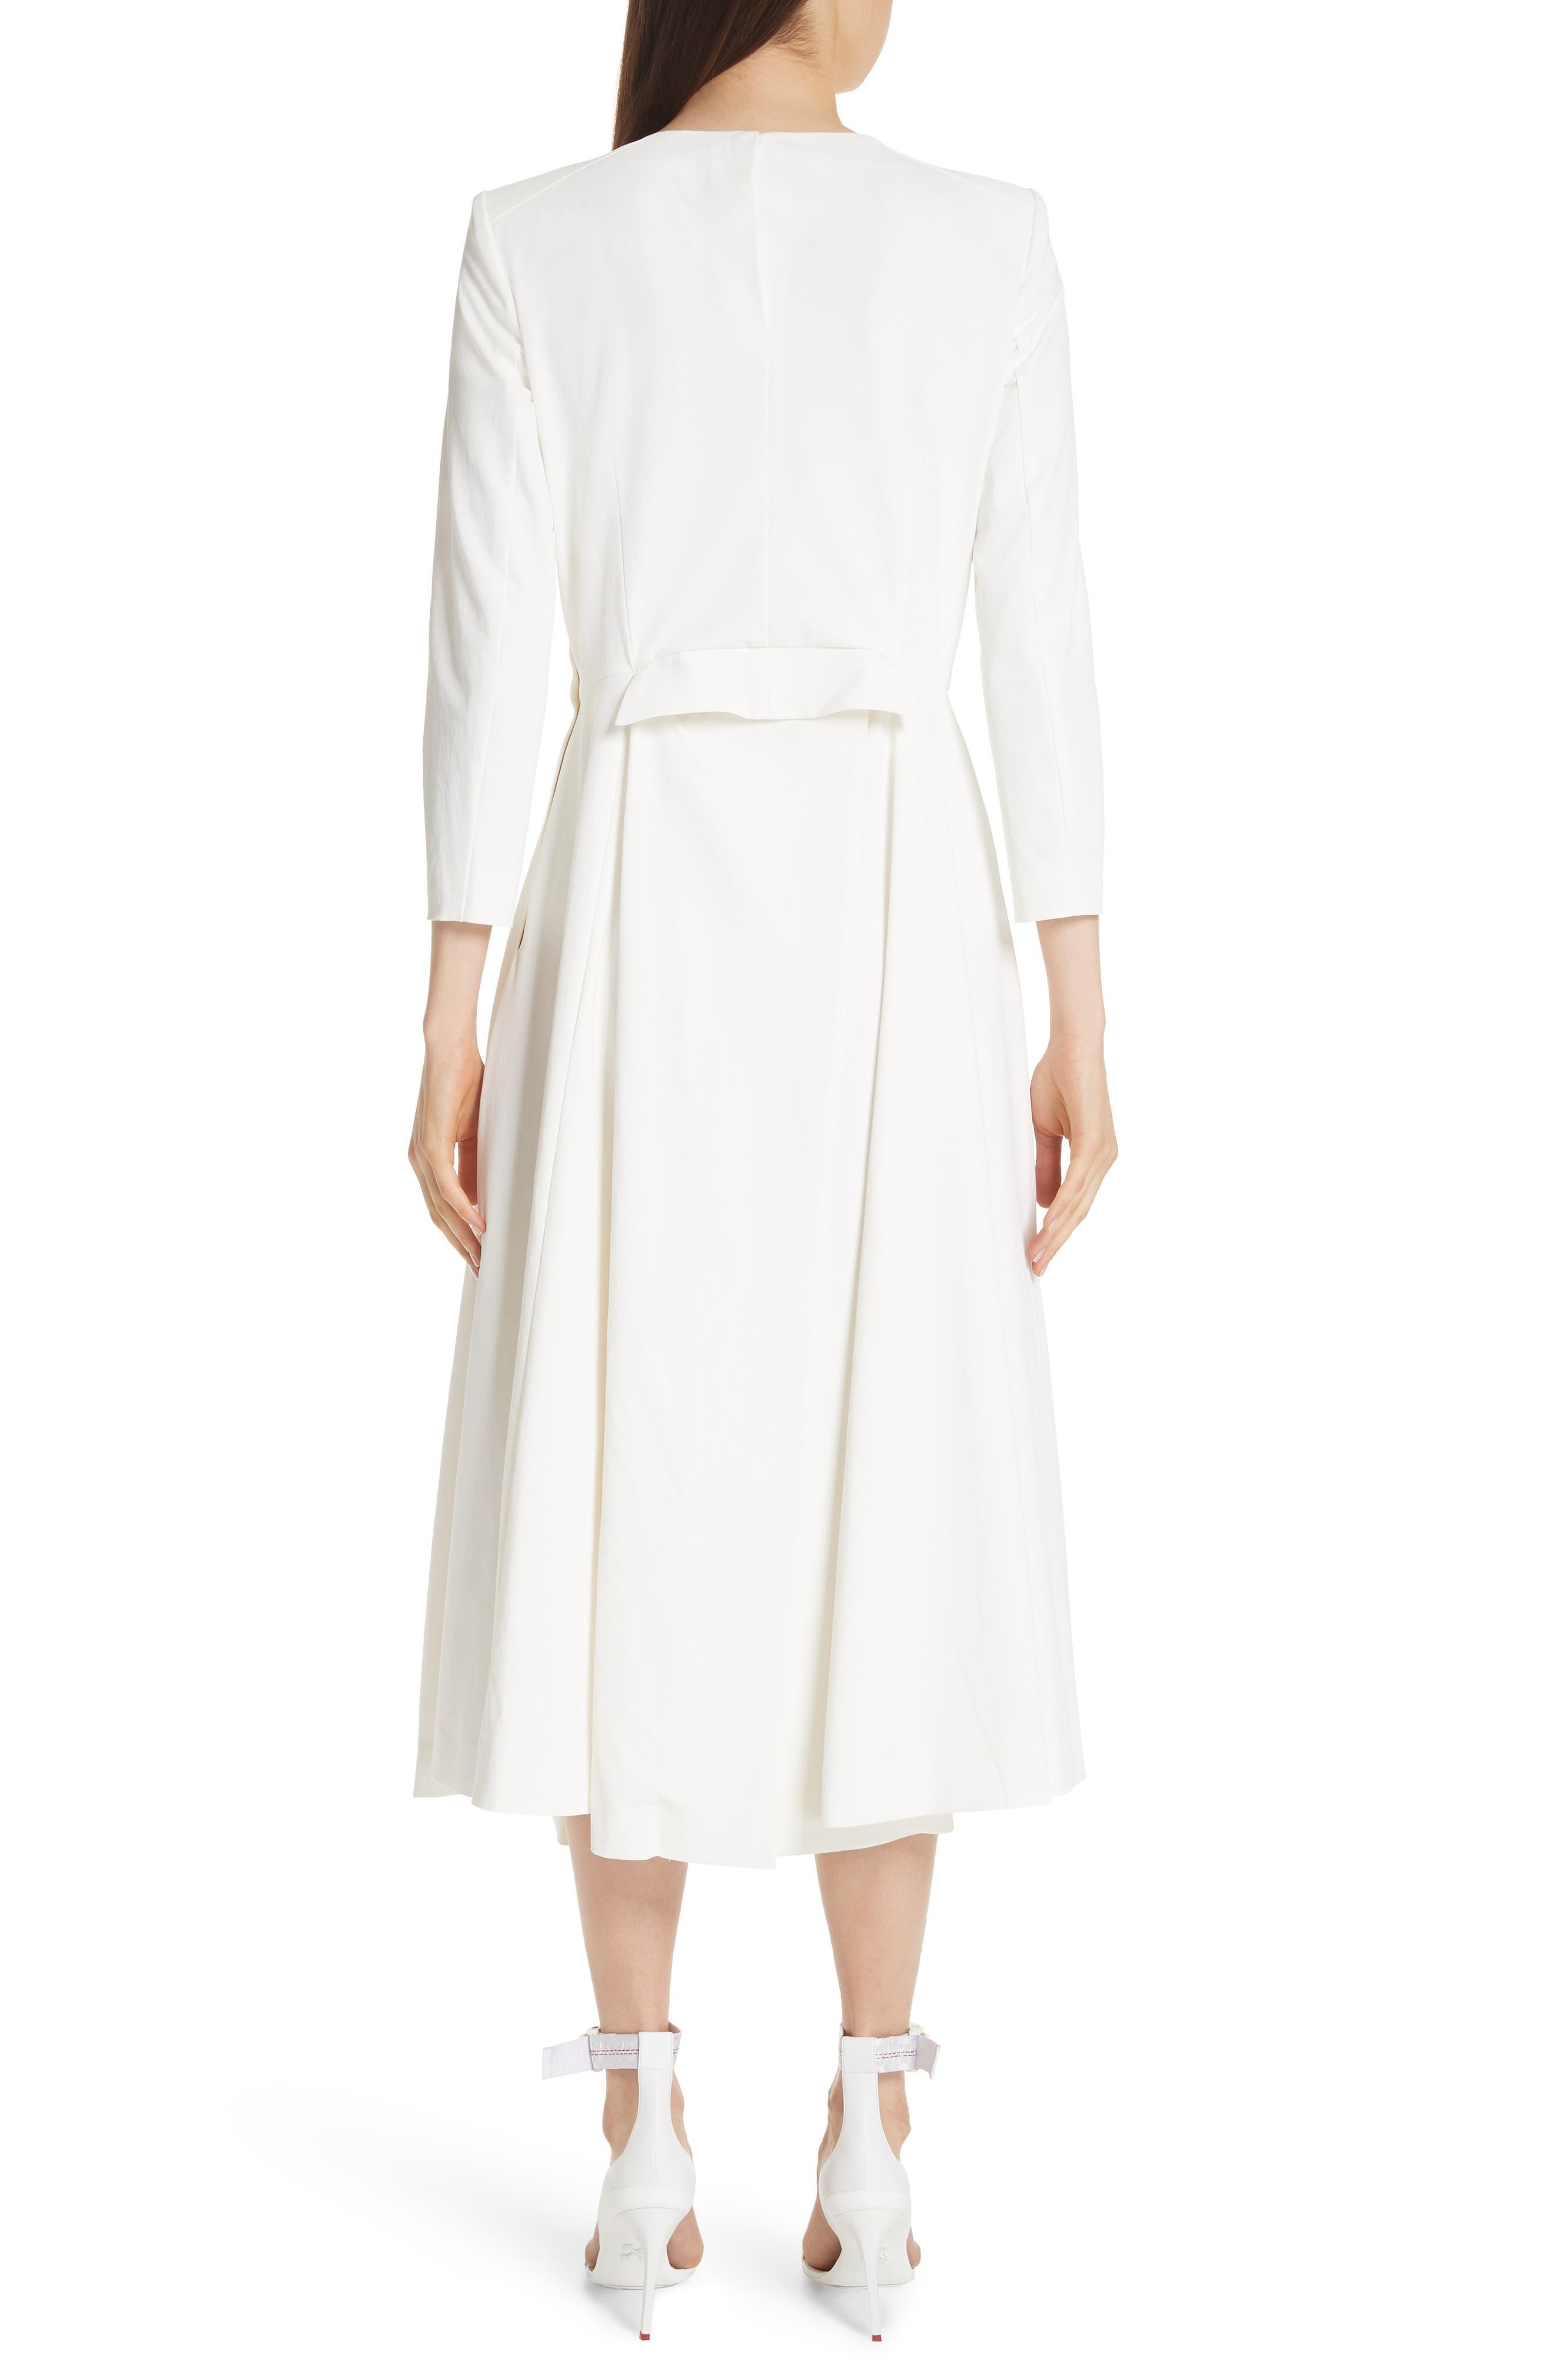 TOGA,                             Beaded Keyhole Dress,                             Alternate thumbnail 2, color,                             100